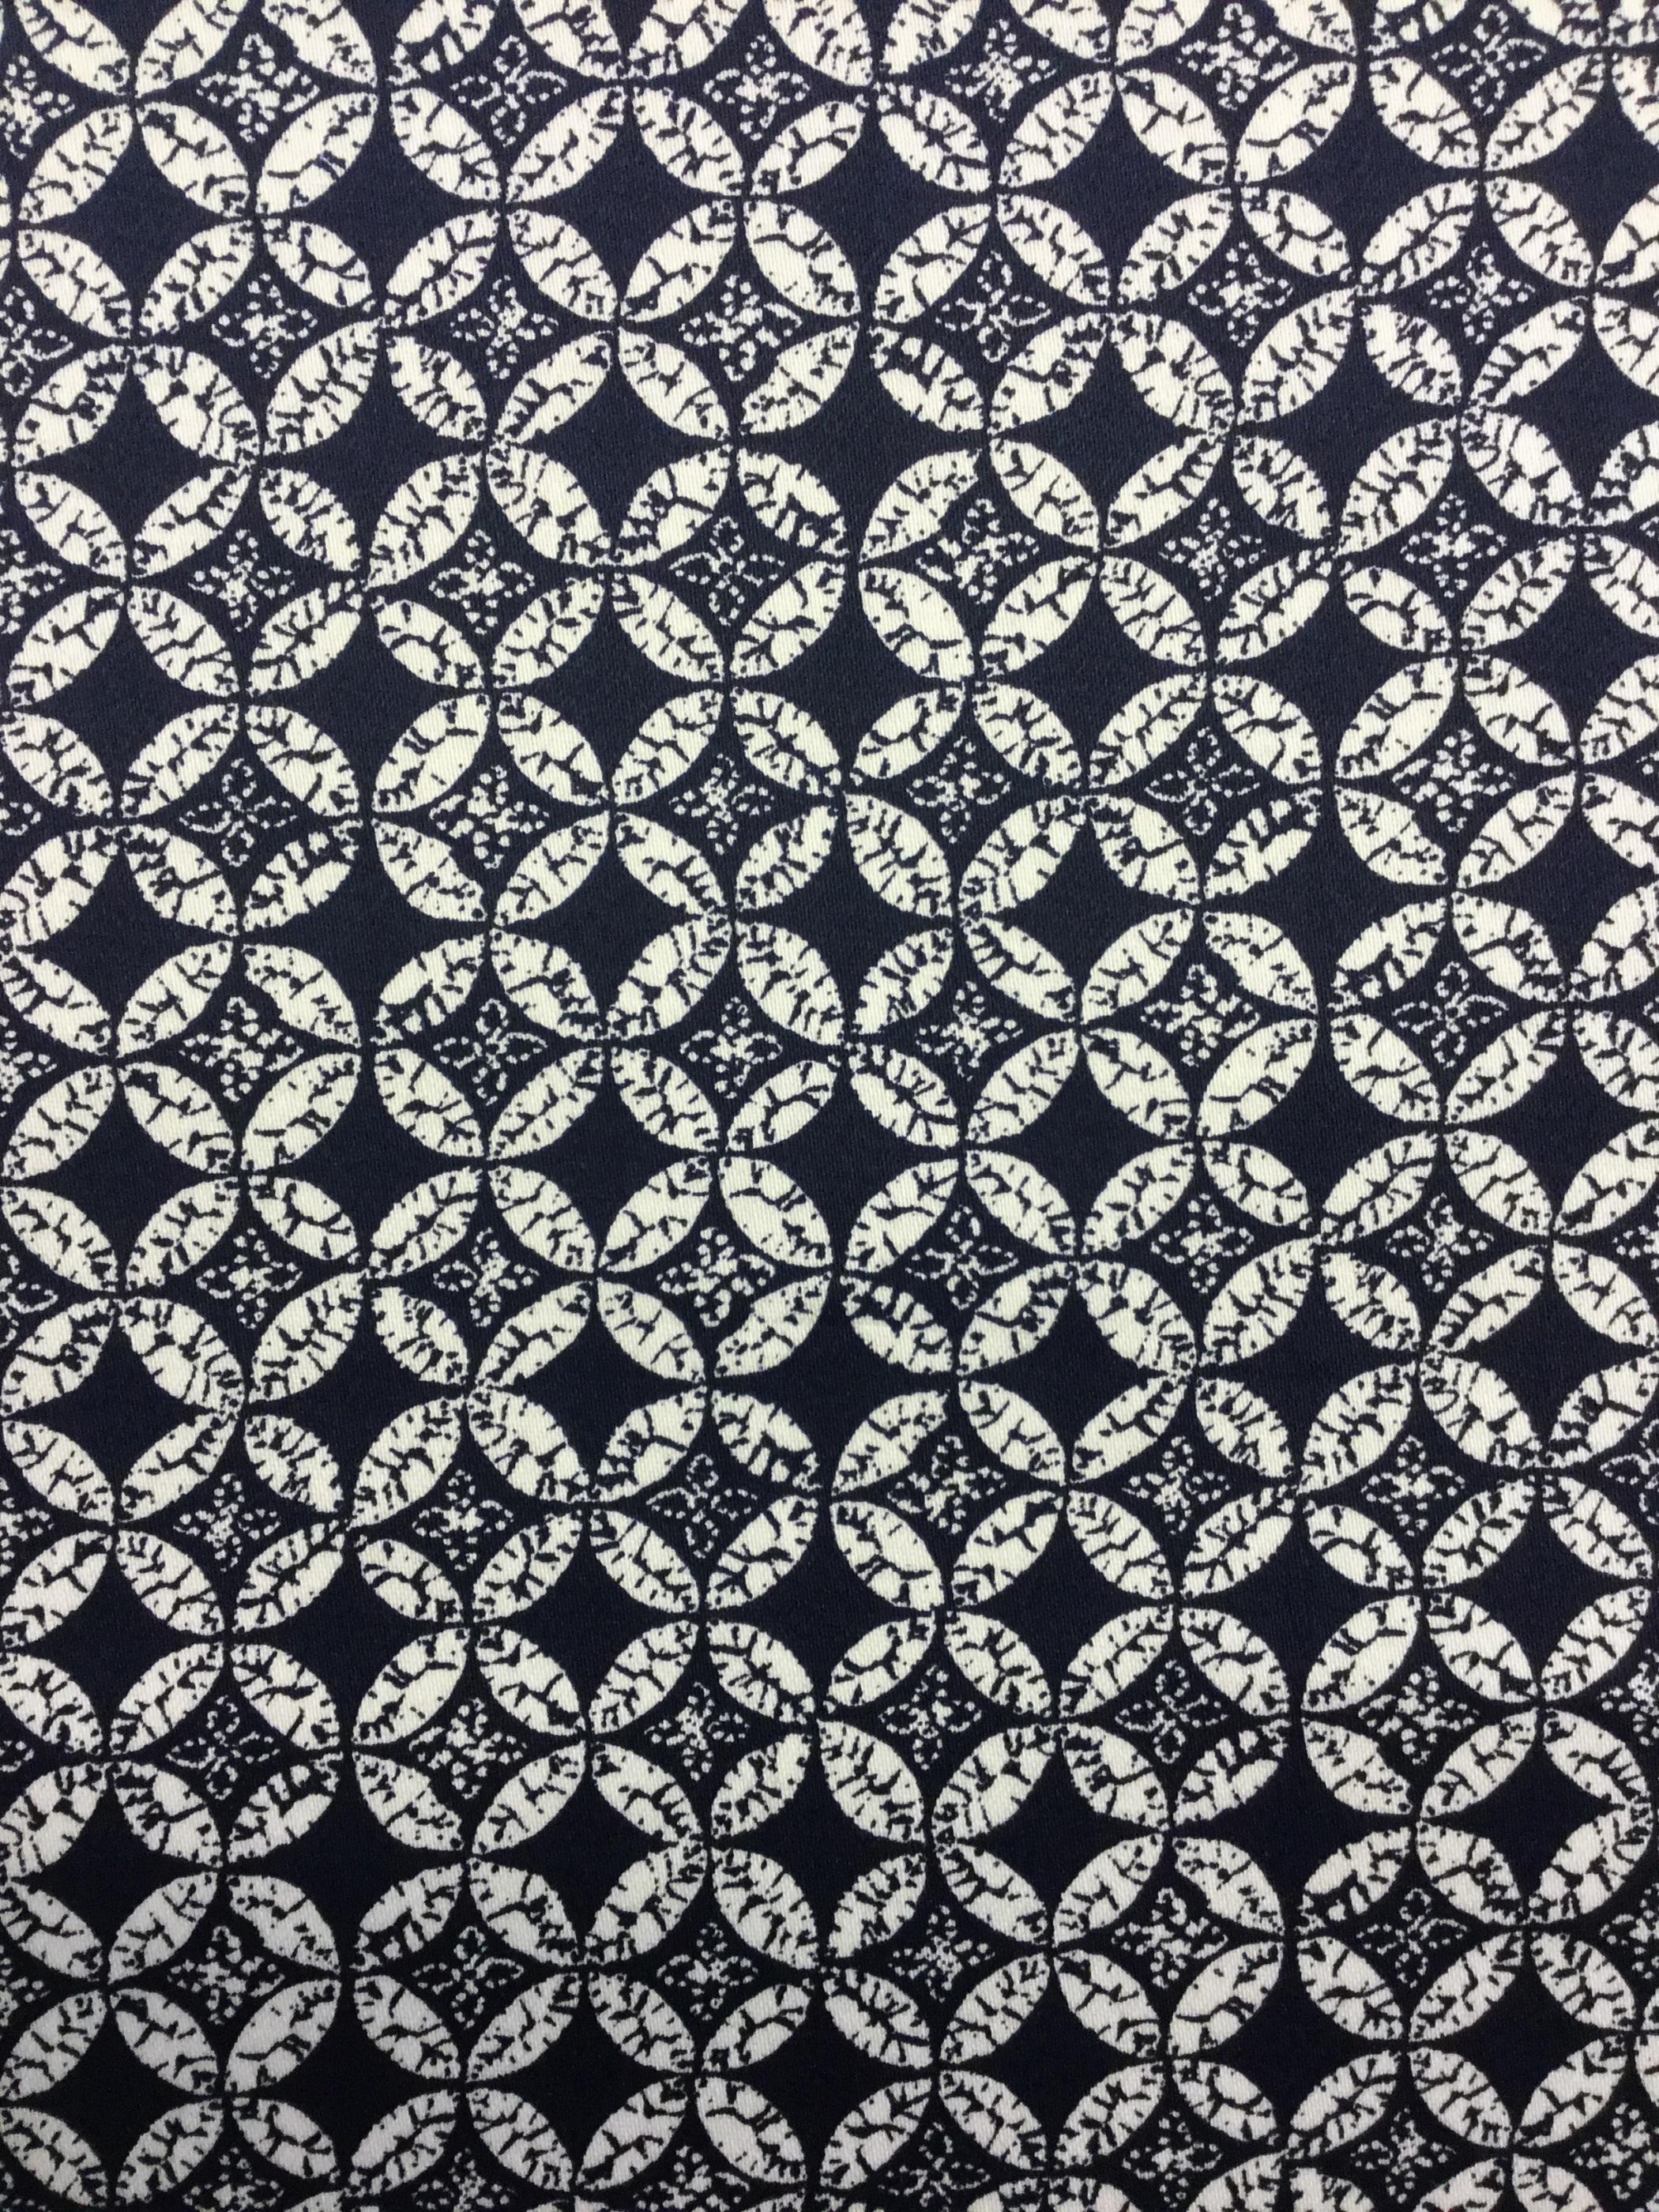 washington blå vit mönster modetyg metervara Tyglust laholm